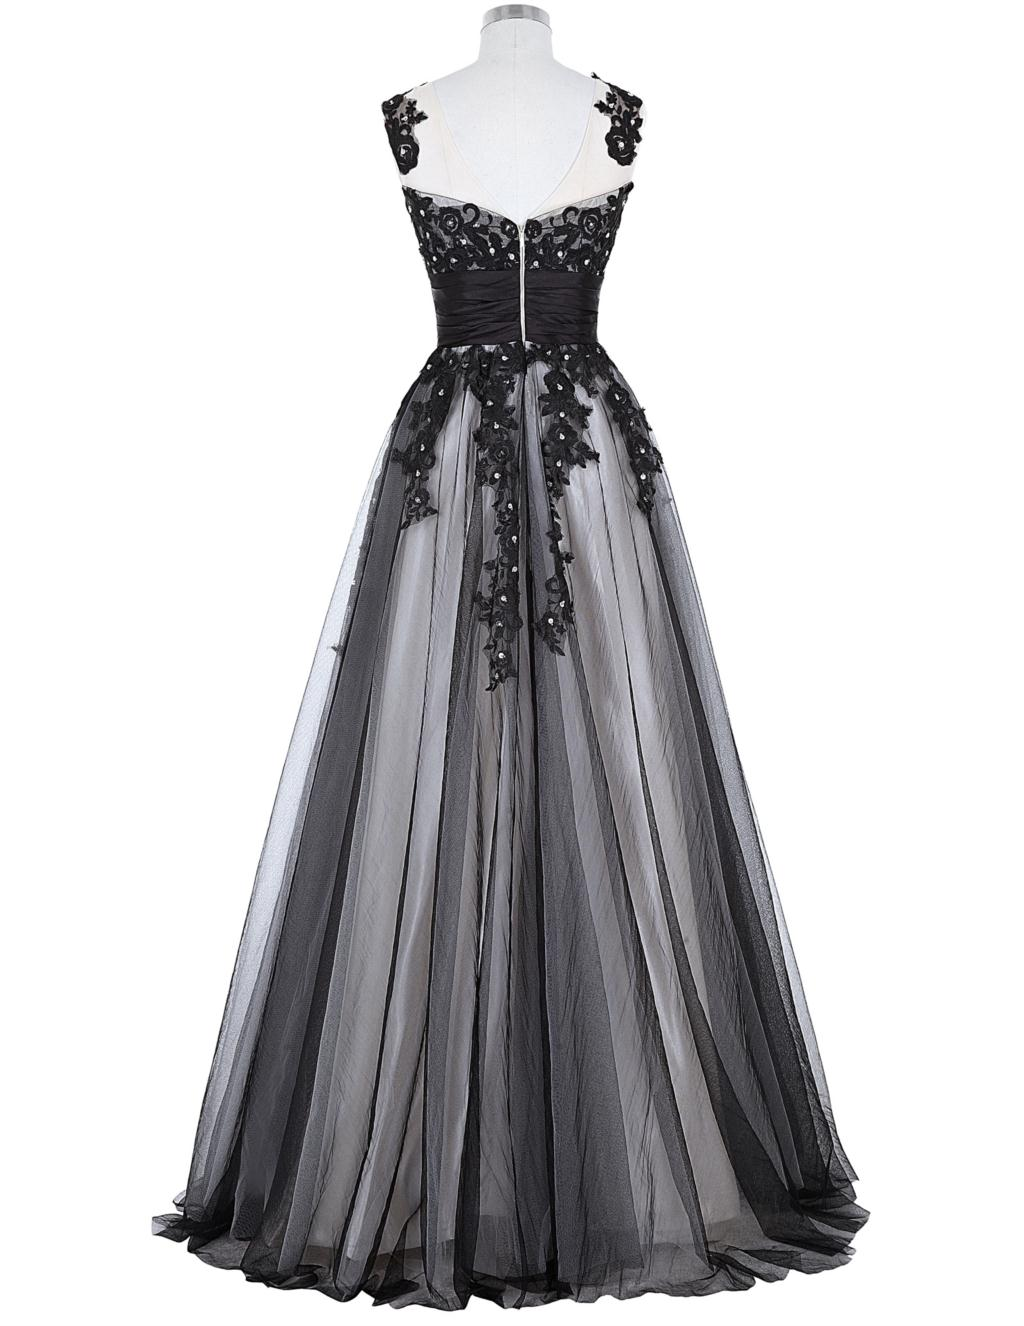 Elegant Lace Appliques Mother of the Bride Dress 15